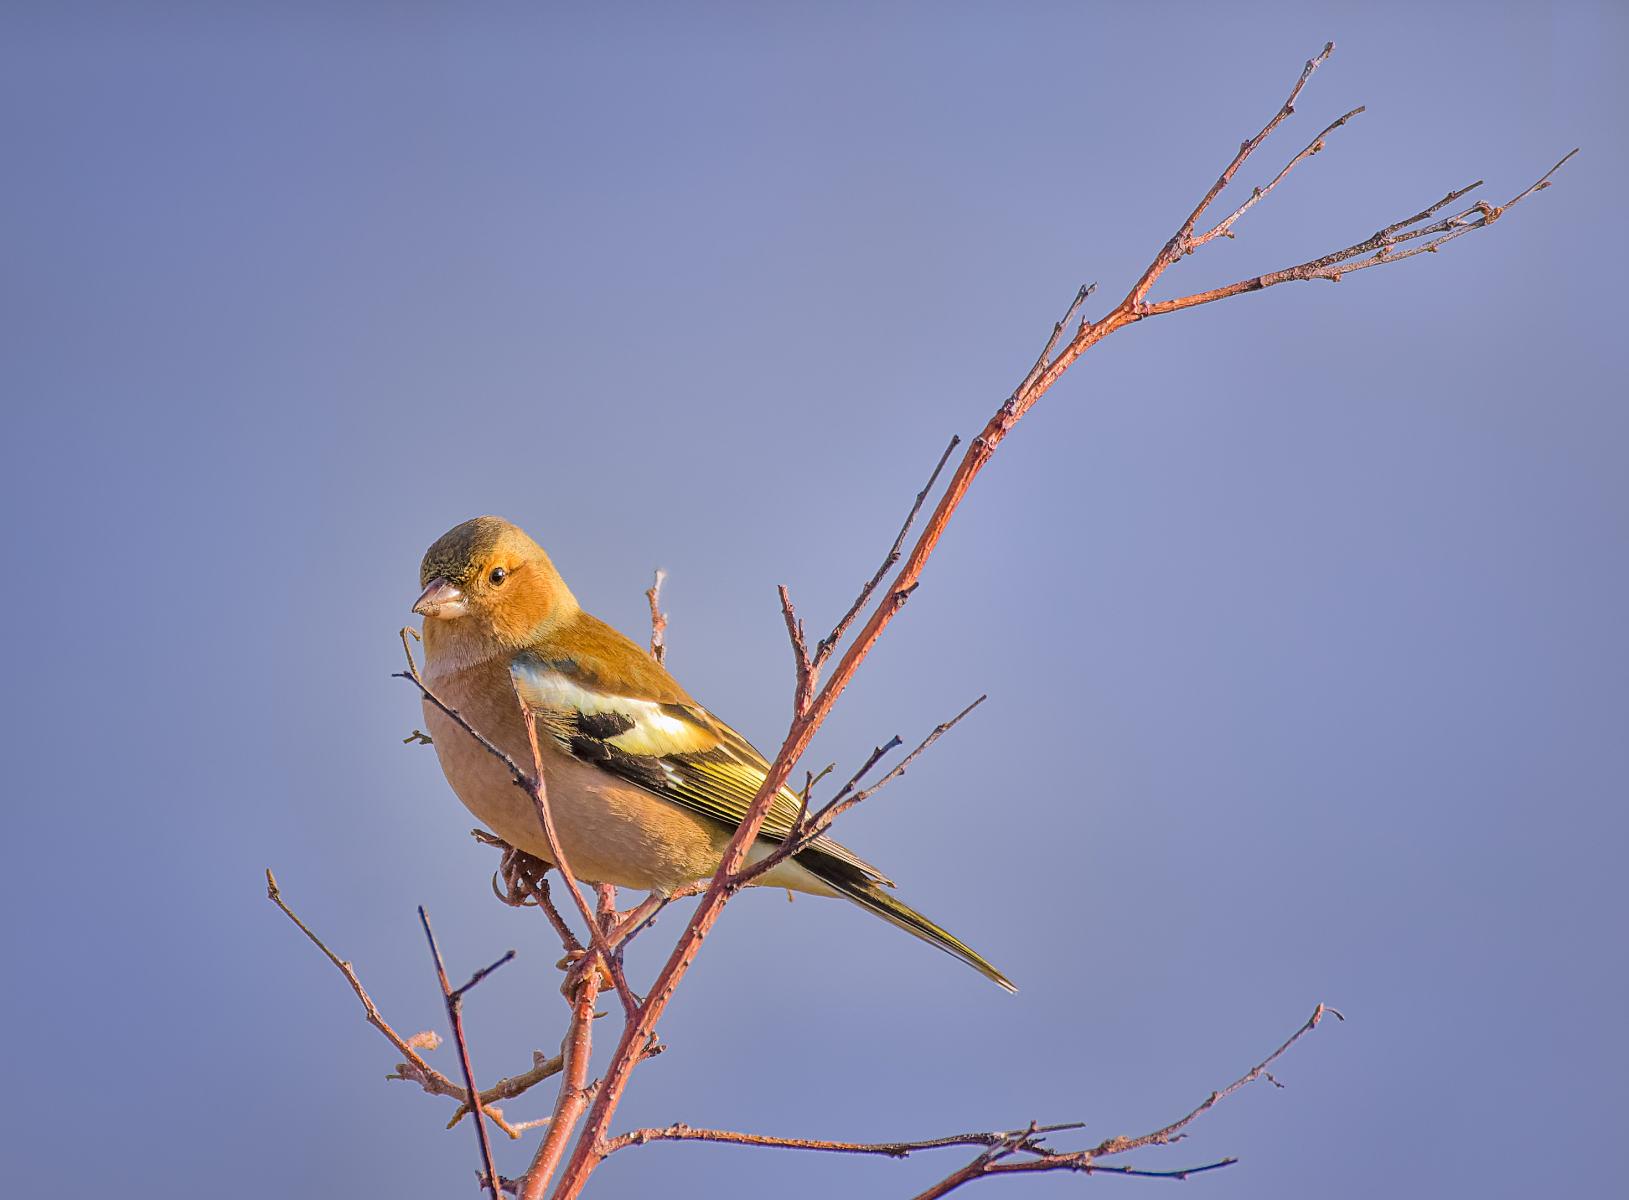 female chaffinch perched on reddish branch